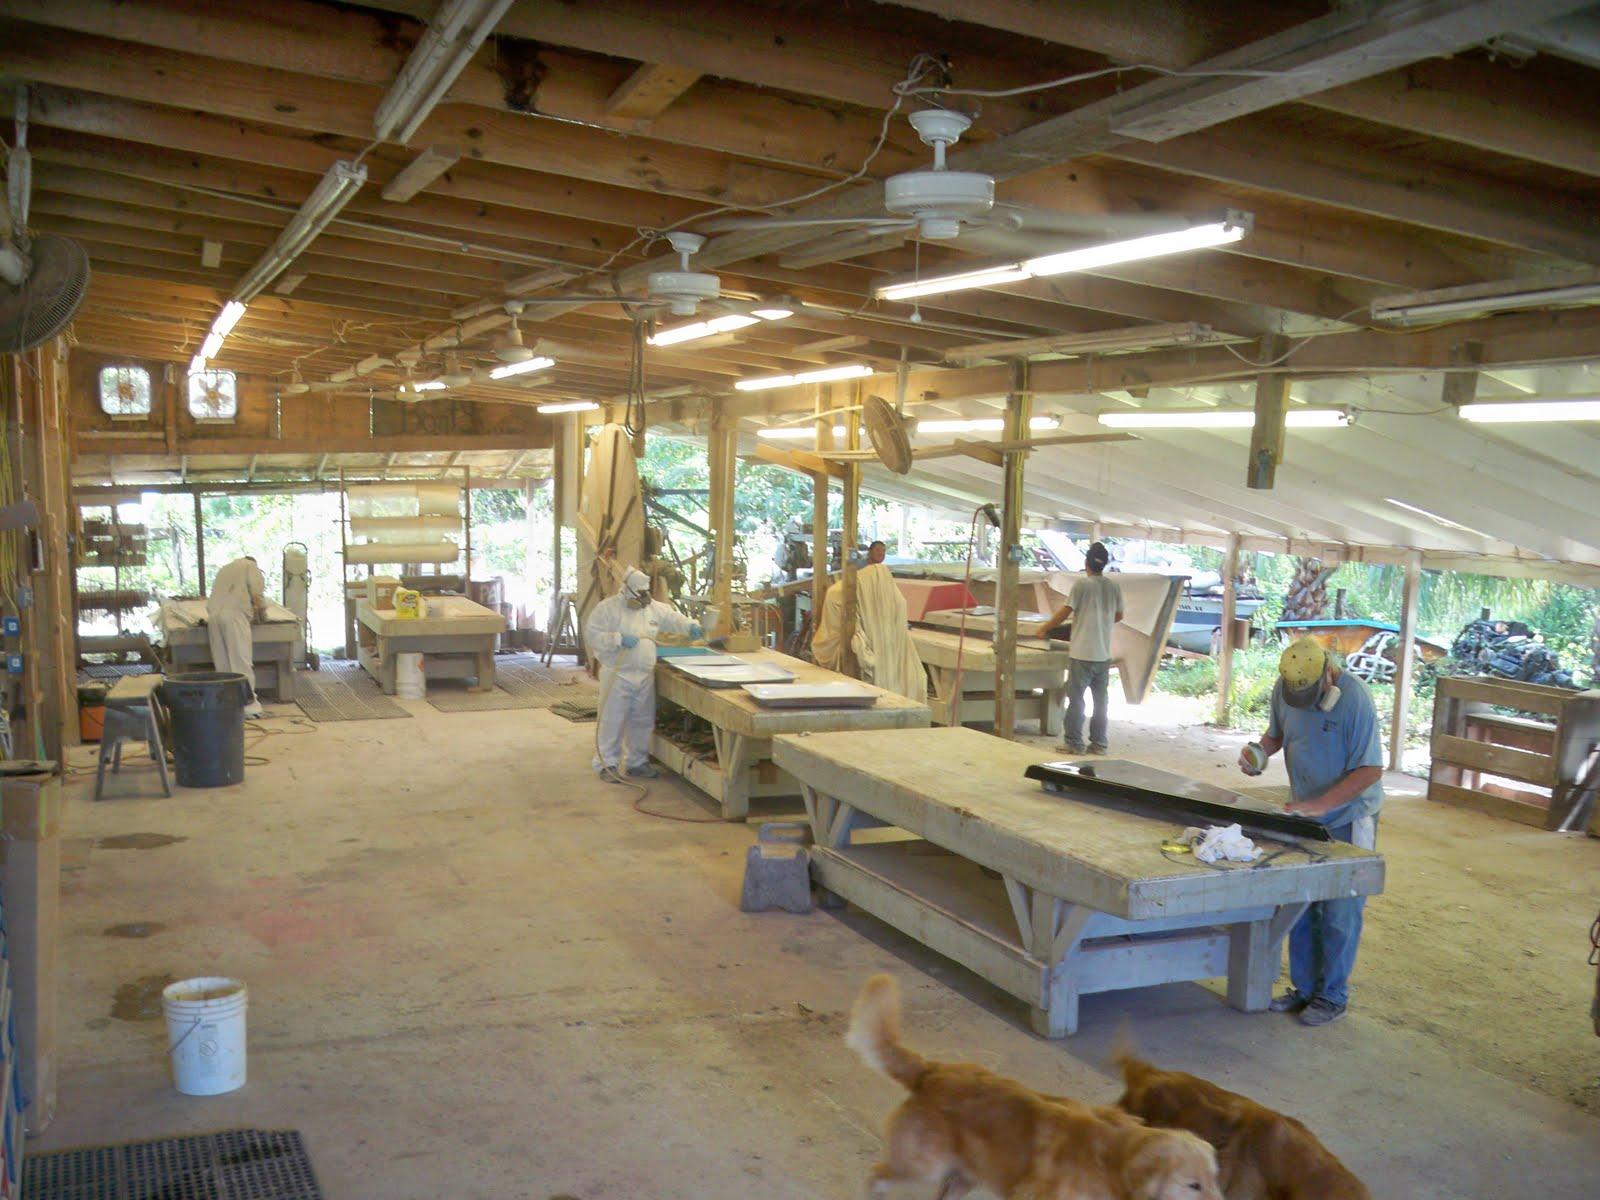 Construction on The Tiki